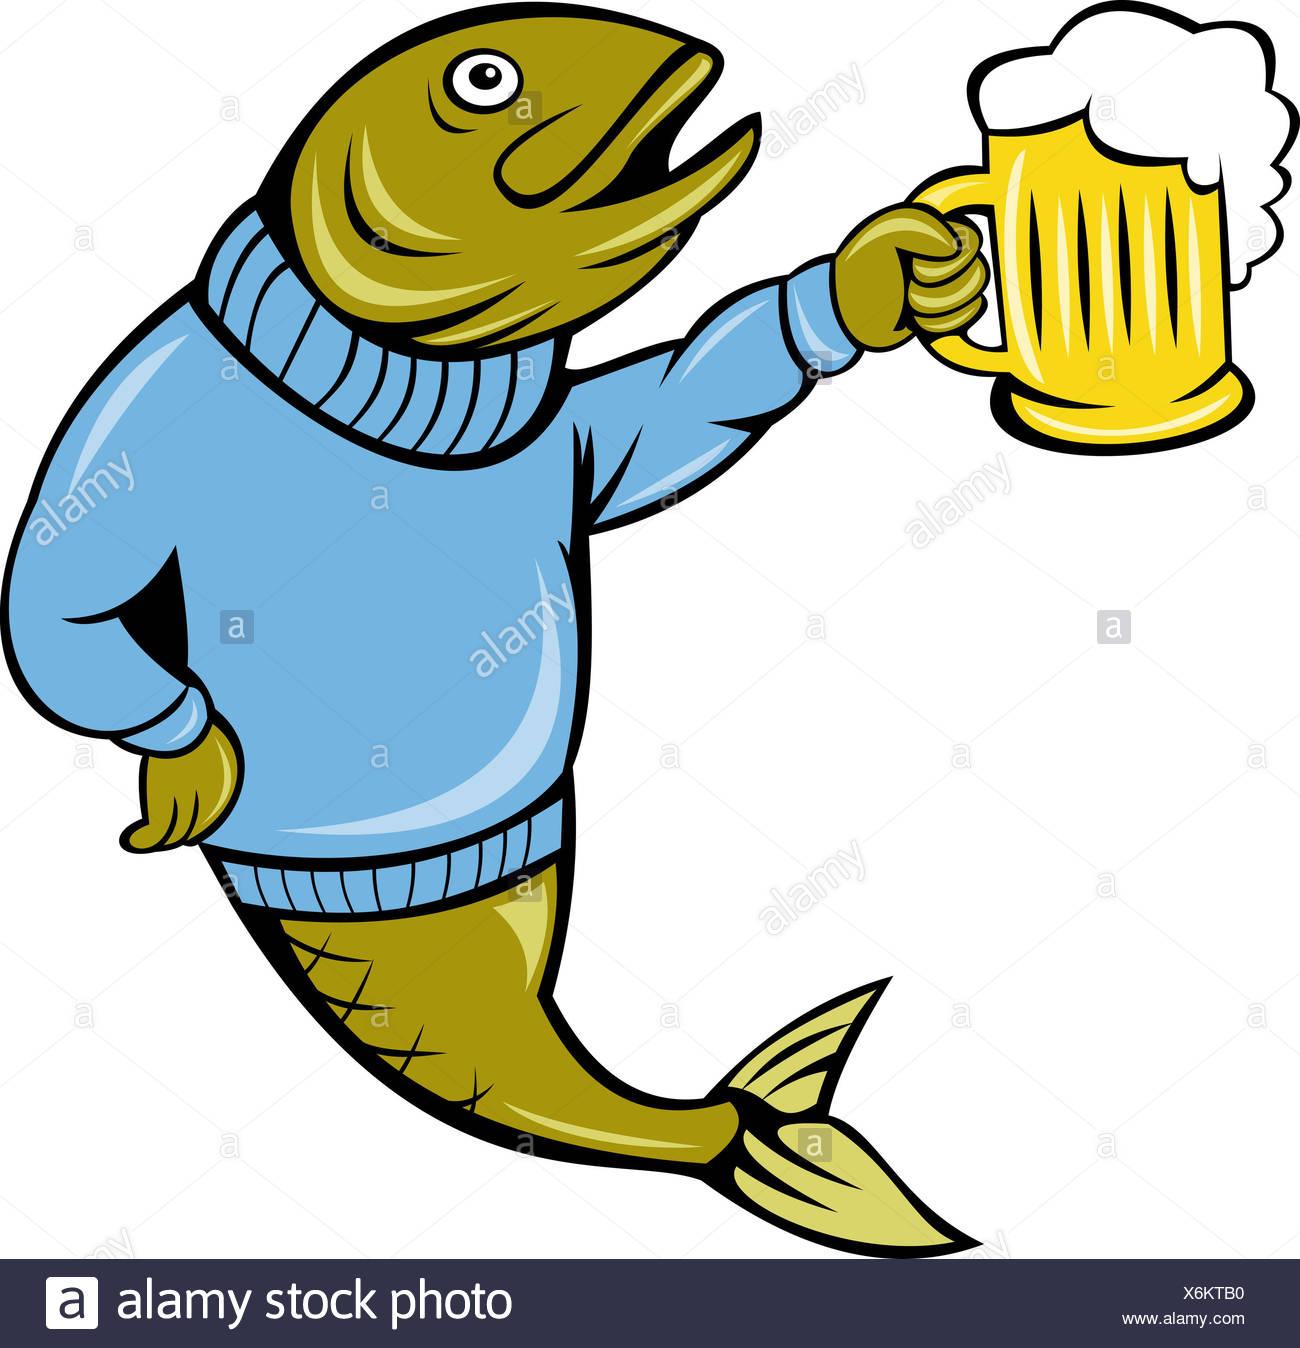 drink drinking bibs fish beer bottle herring cartoon lager drink.